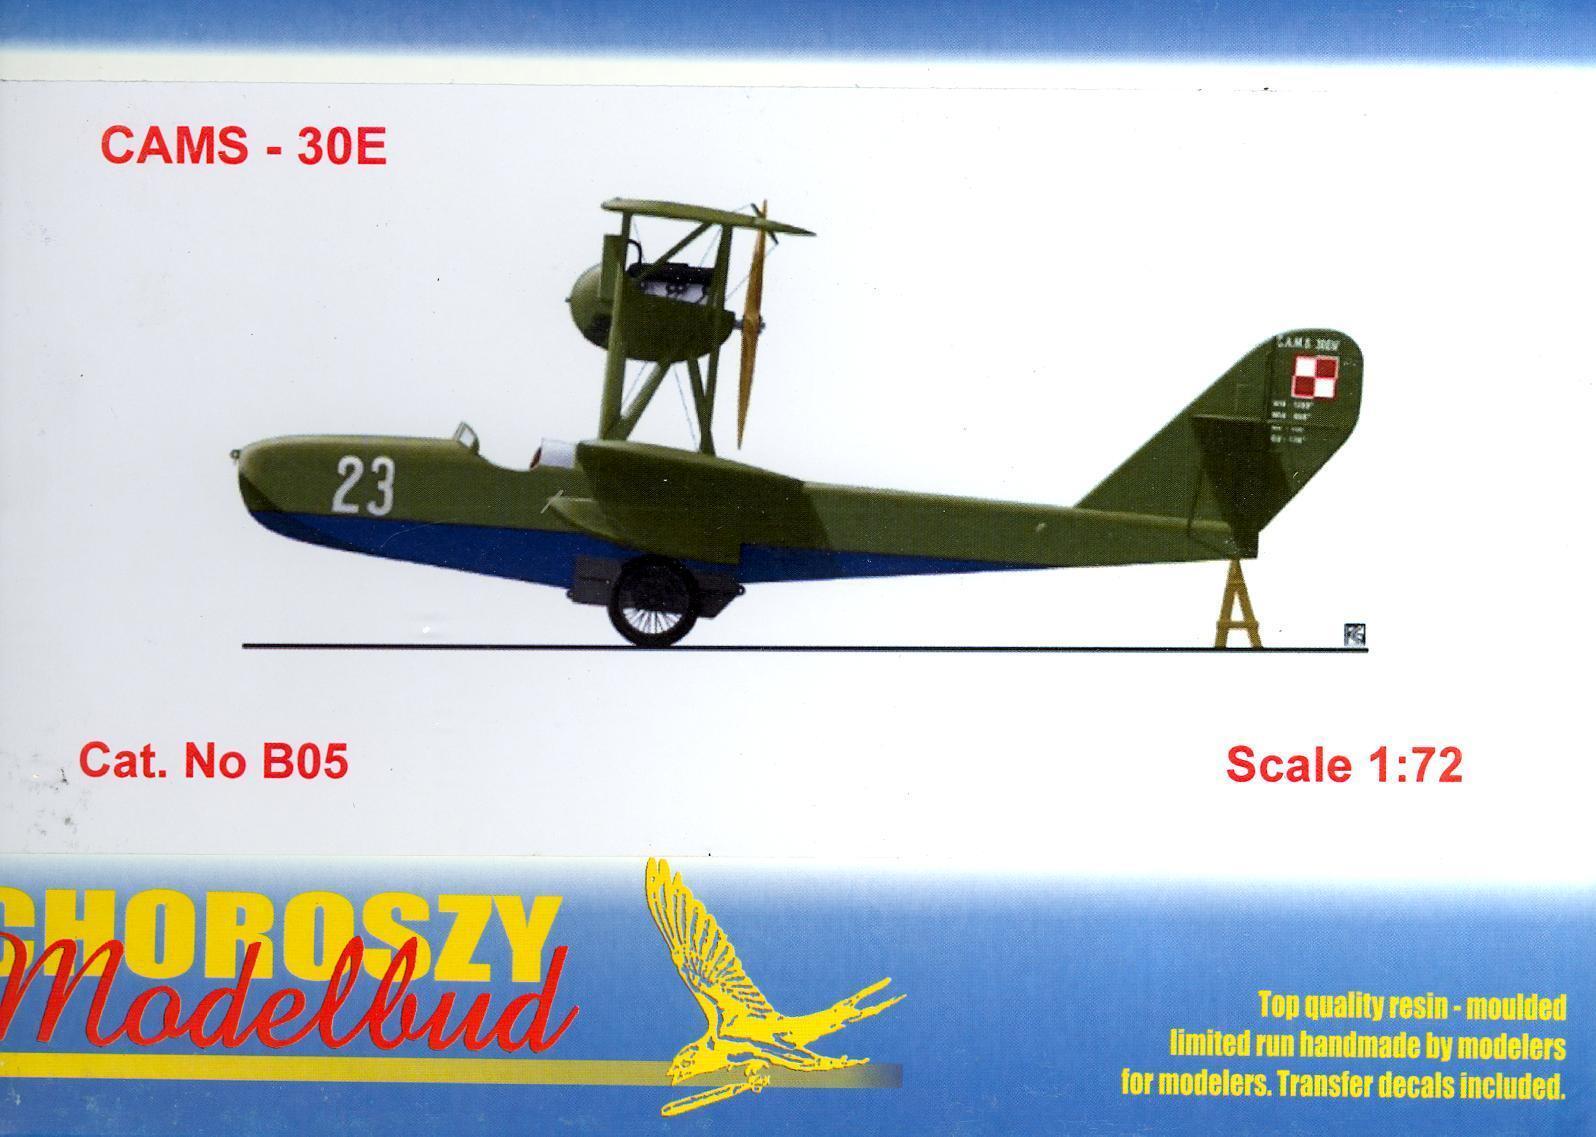 Chgoldszy Models 1 72 CAMS 30E French Seaplane